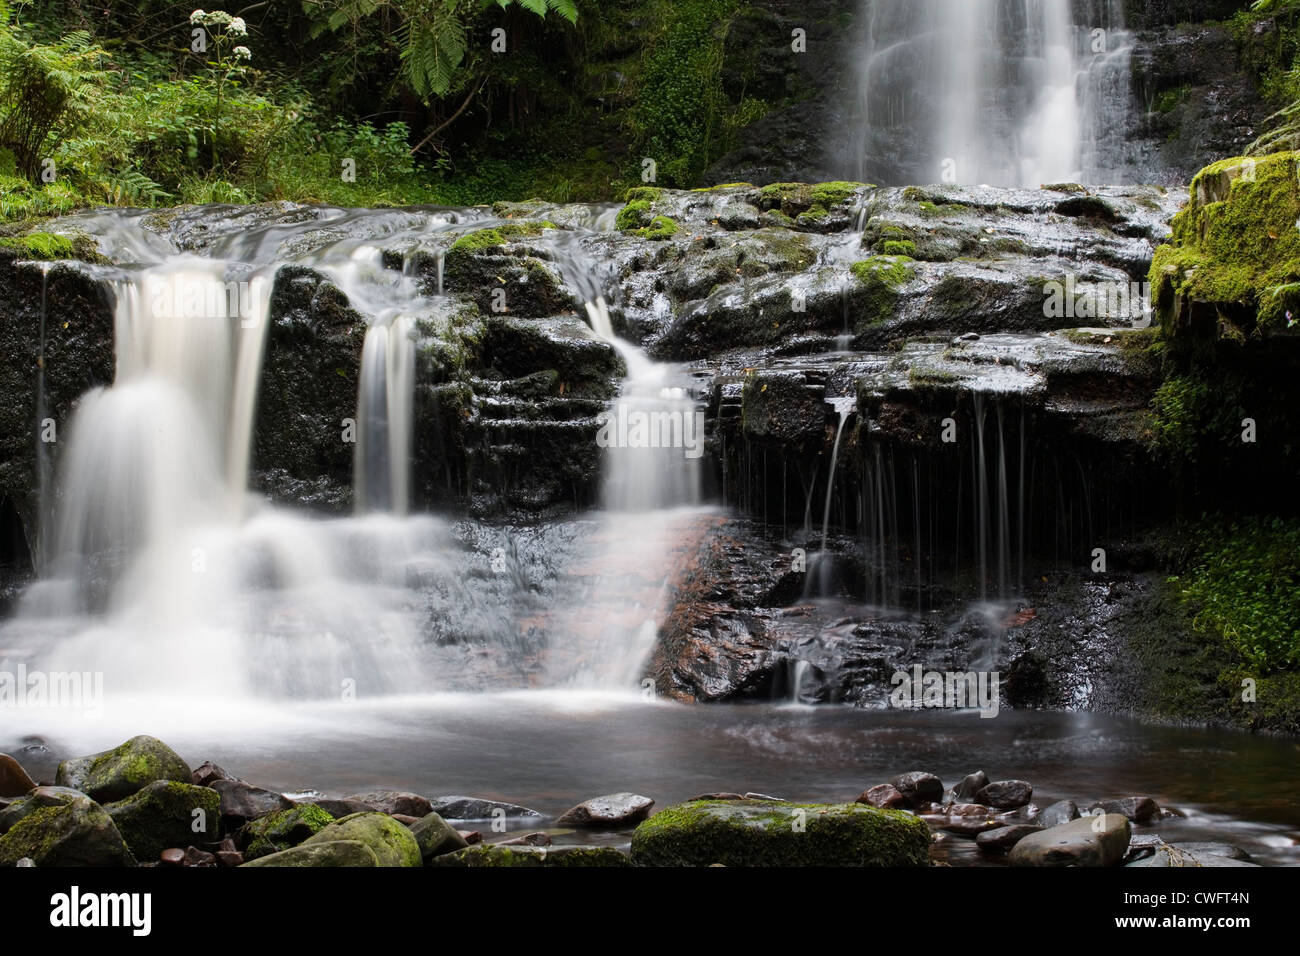 Waterfall at Blaen-y-glyn Stock Photo